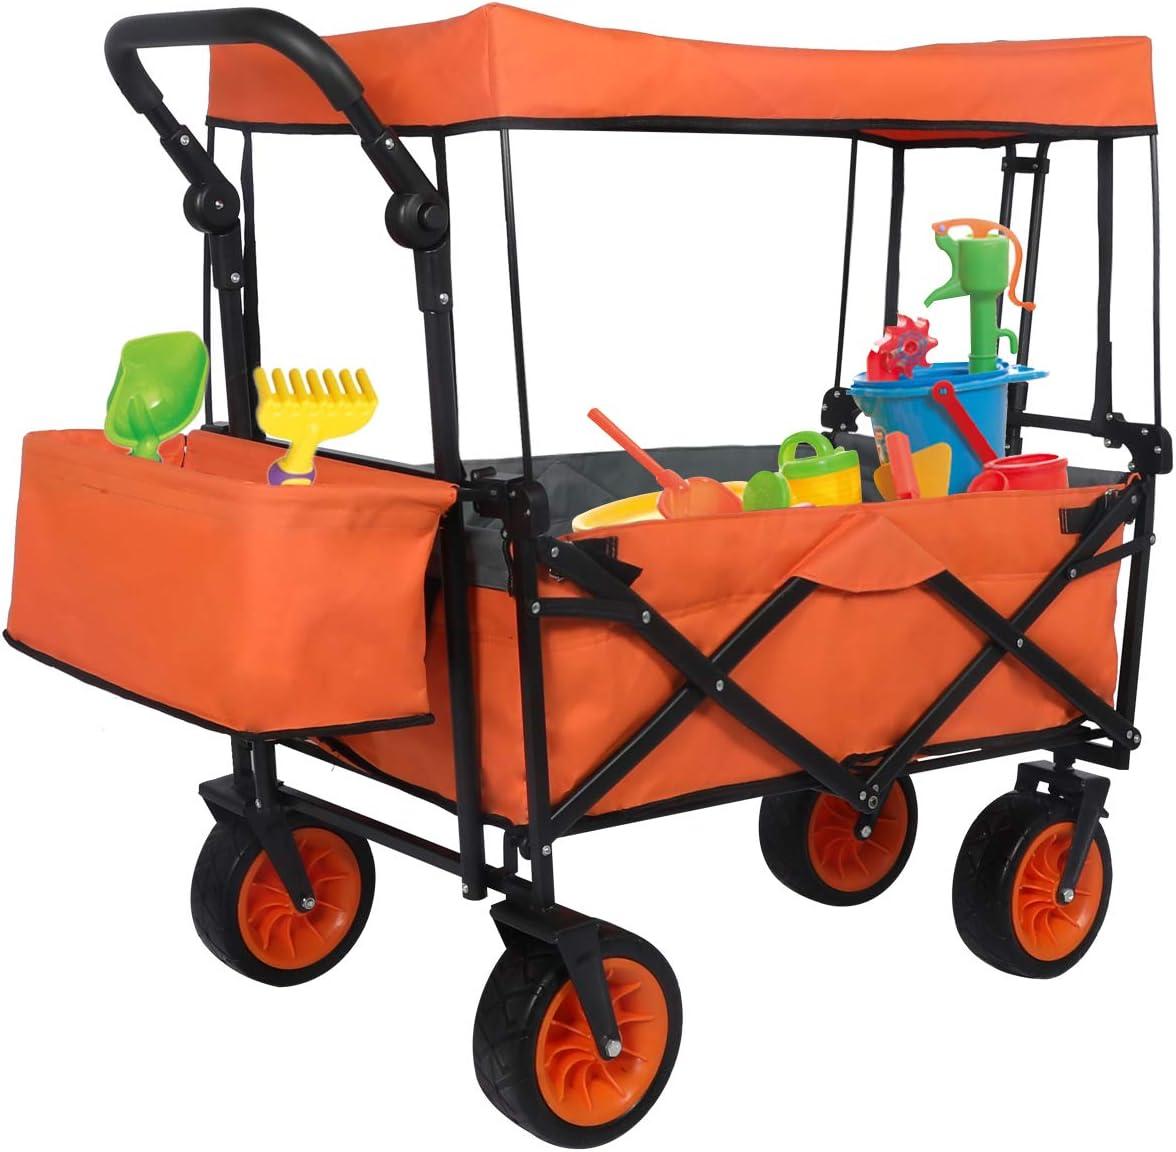 GBU Push and Pull Folding Best Portable Wagons